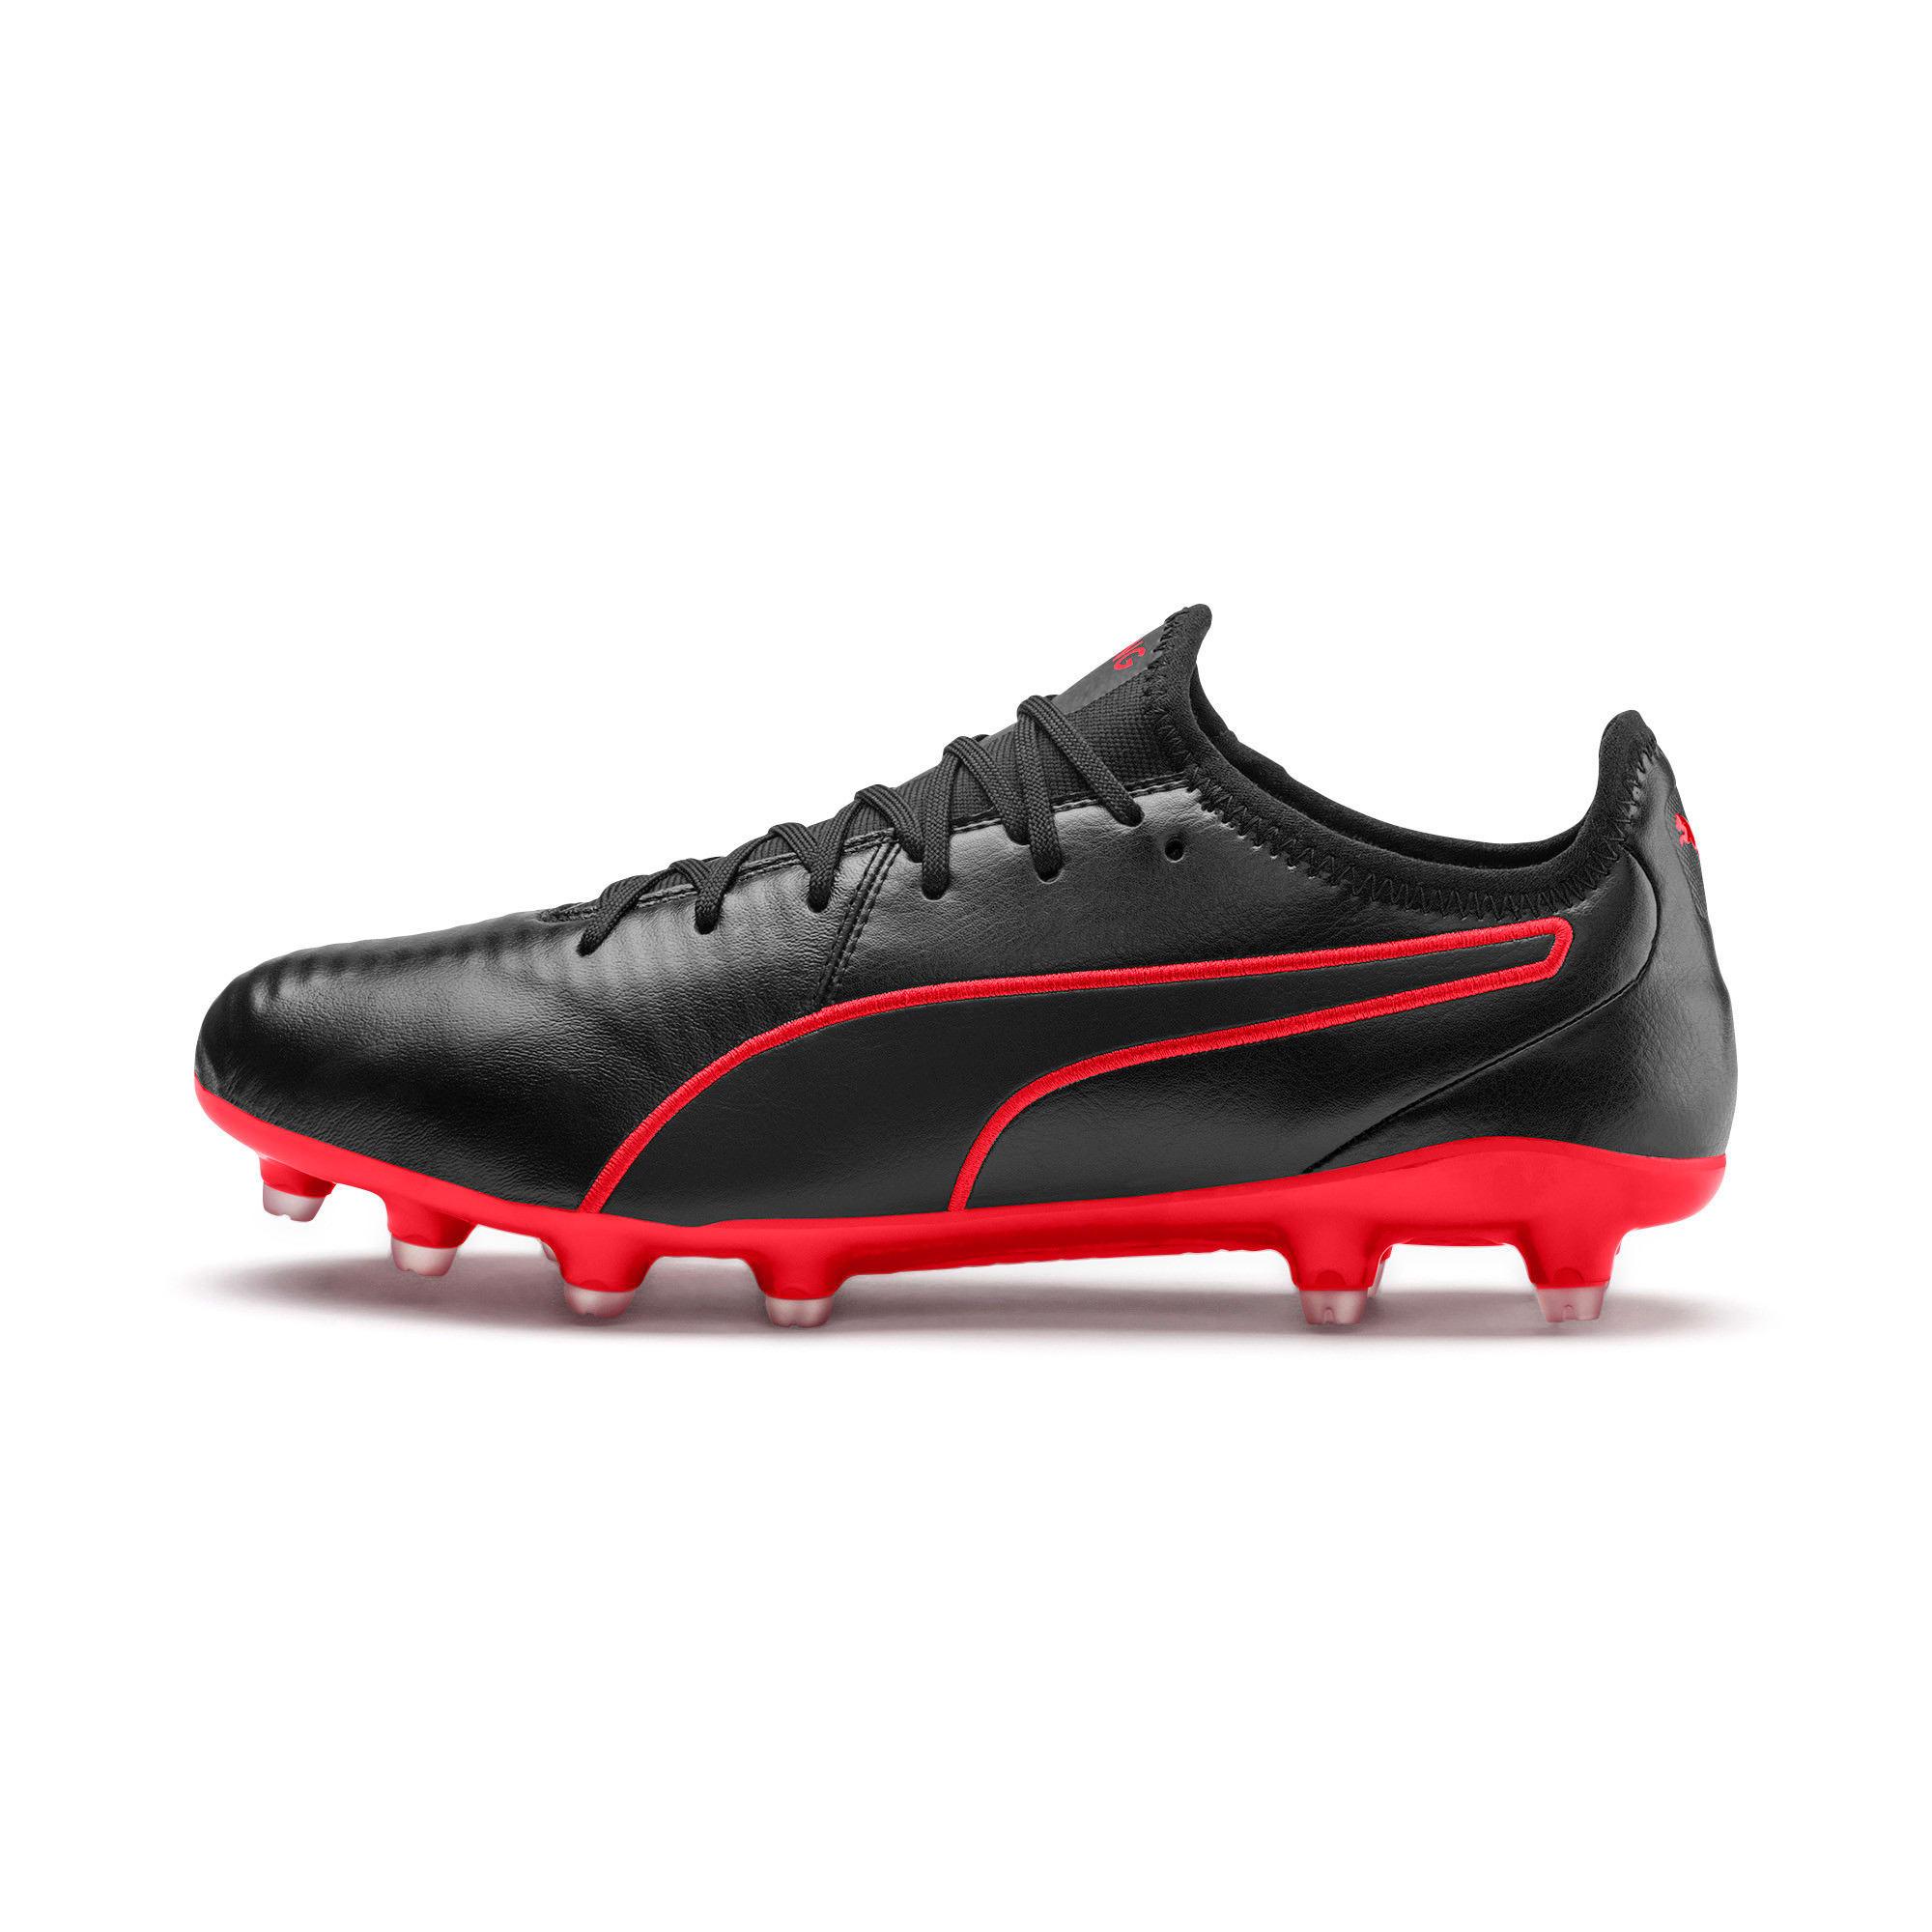 Thumbnail 1 of King Pro FG Soccer Cleats, Puma Black-High Risk Red, medium